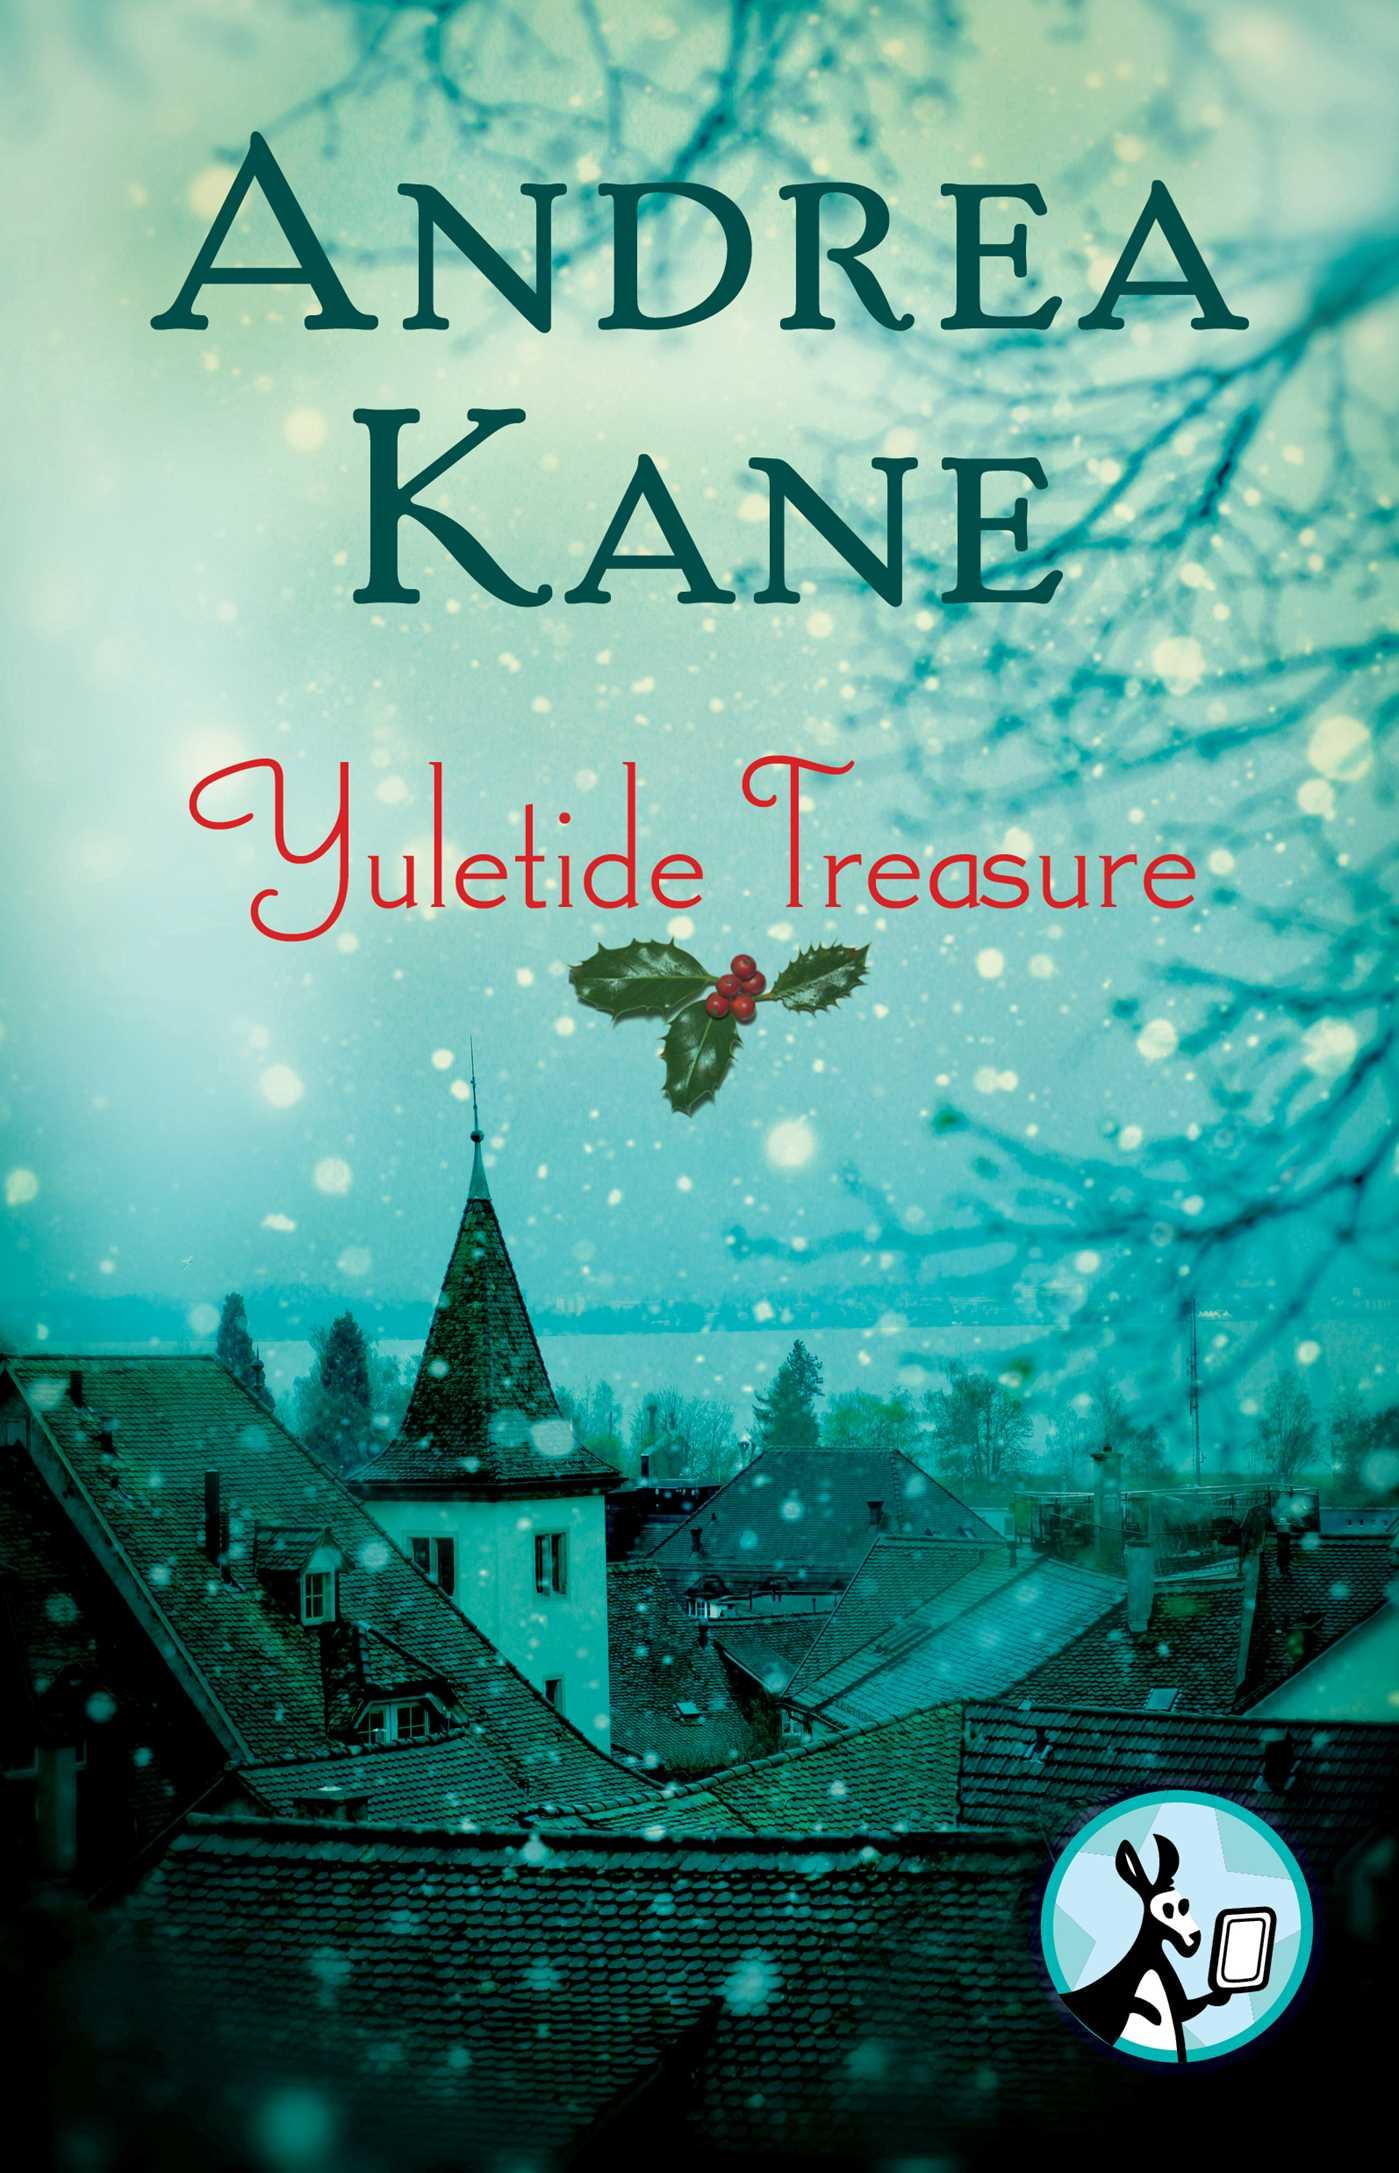 Yuletide treasure 9781476708553 hr